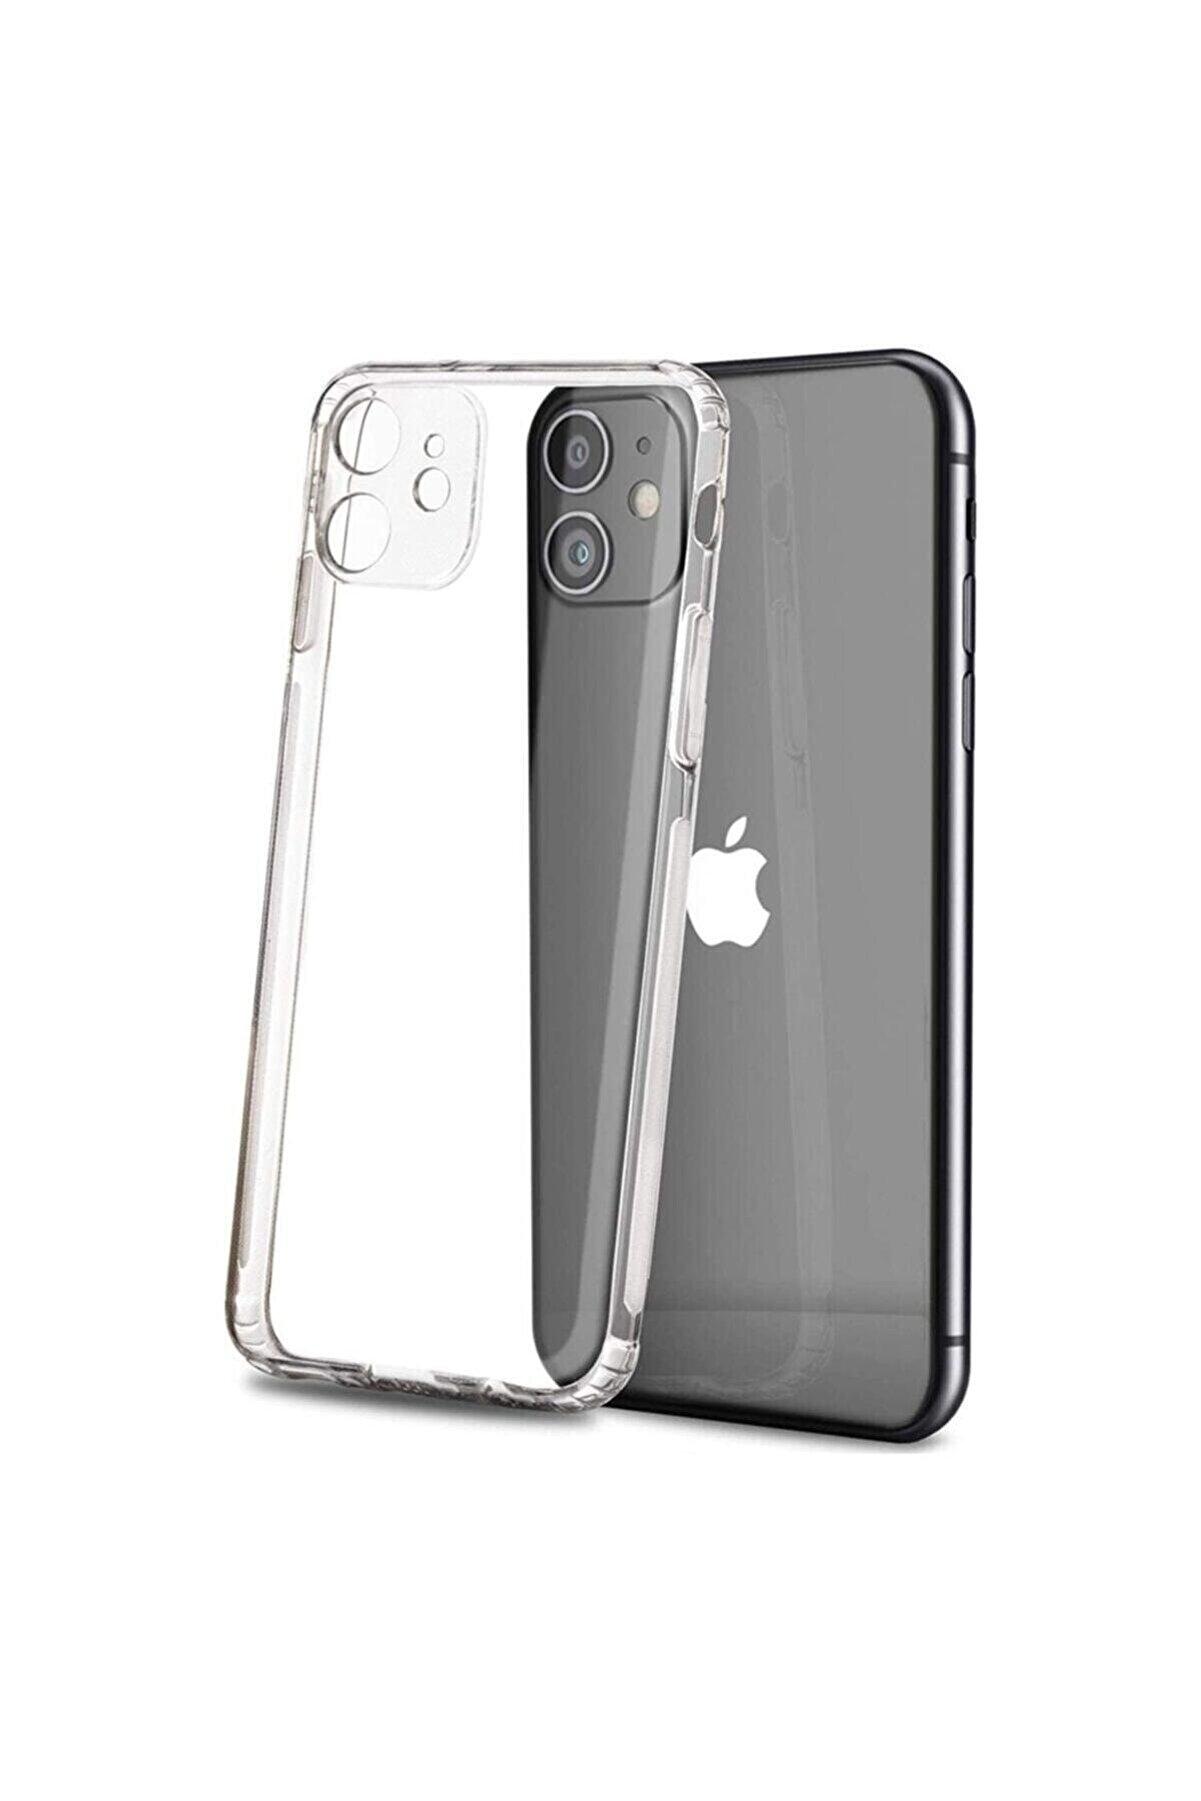 KAPAKCIMIZ Apple Iphone 12 6.1 Kılıf Kamera Korumalı Tıpalı Şeffaf Kristal Silikon Kapak